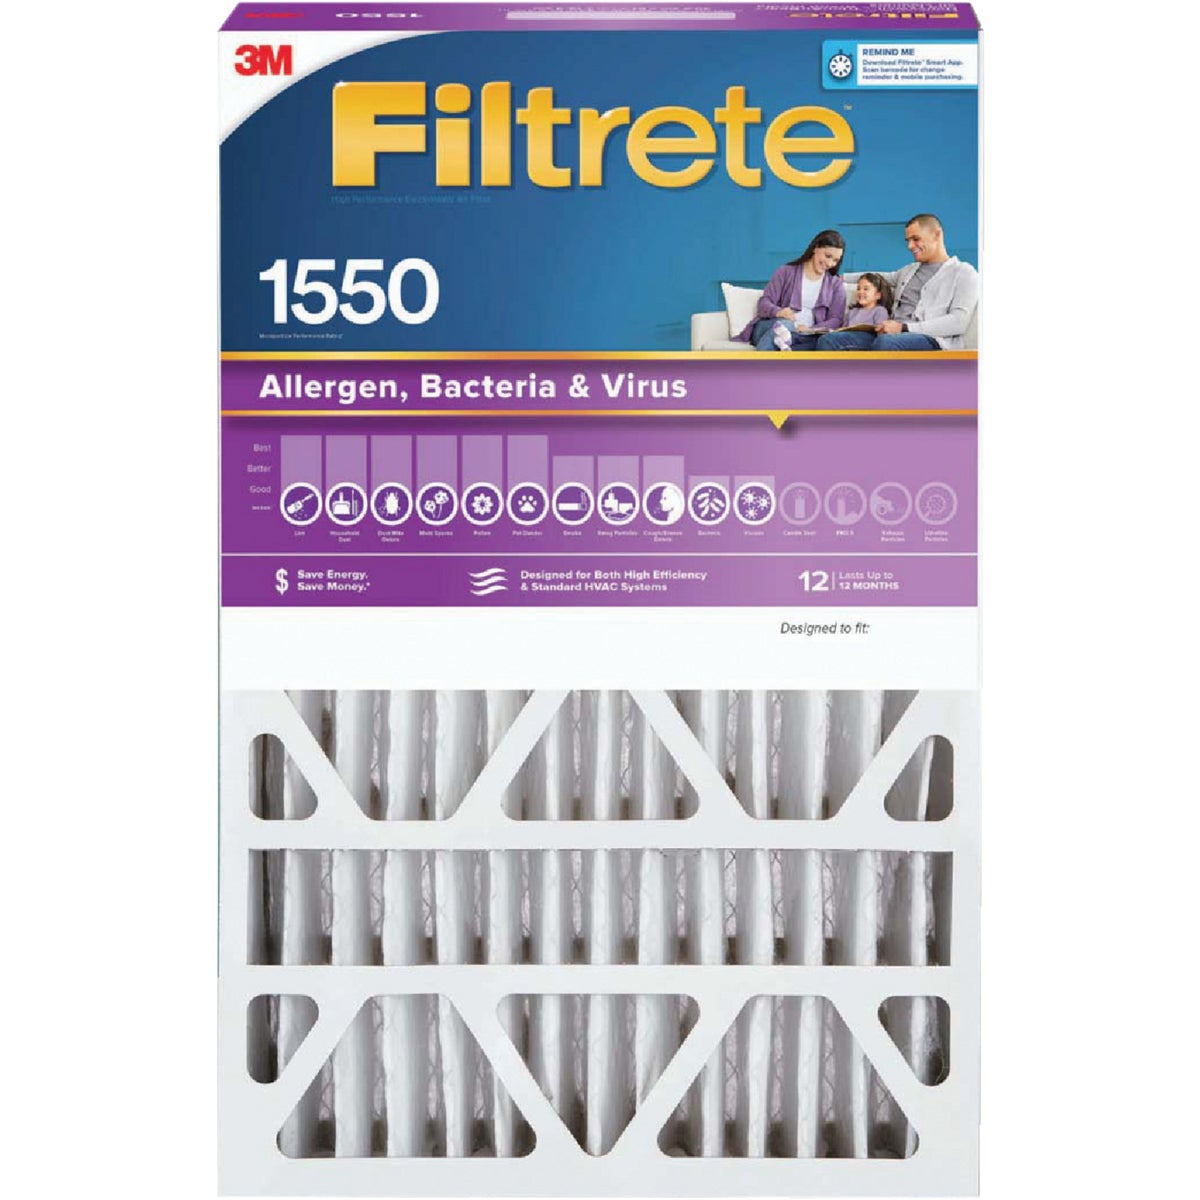 "3M Filtrete 20"" x 25"" x 4"" (Slim Fit) Allergen, Bacteria & Virus 1550 MPR Deep Pleat Furnace Filter"